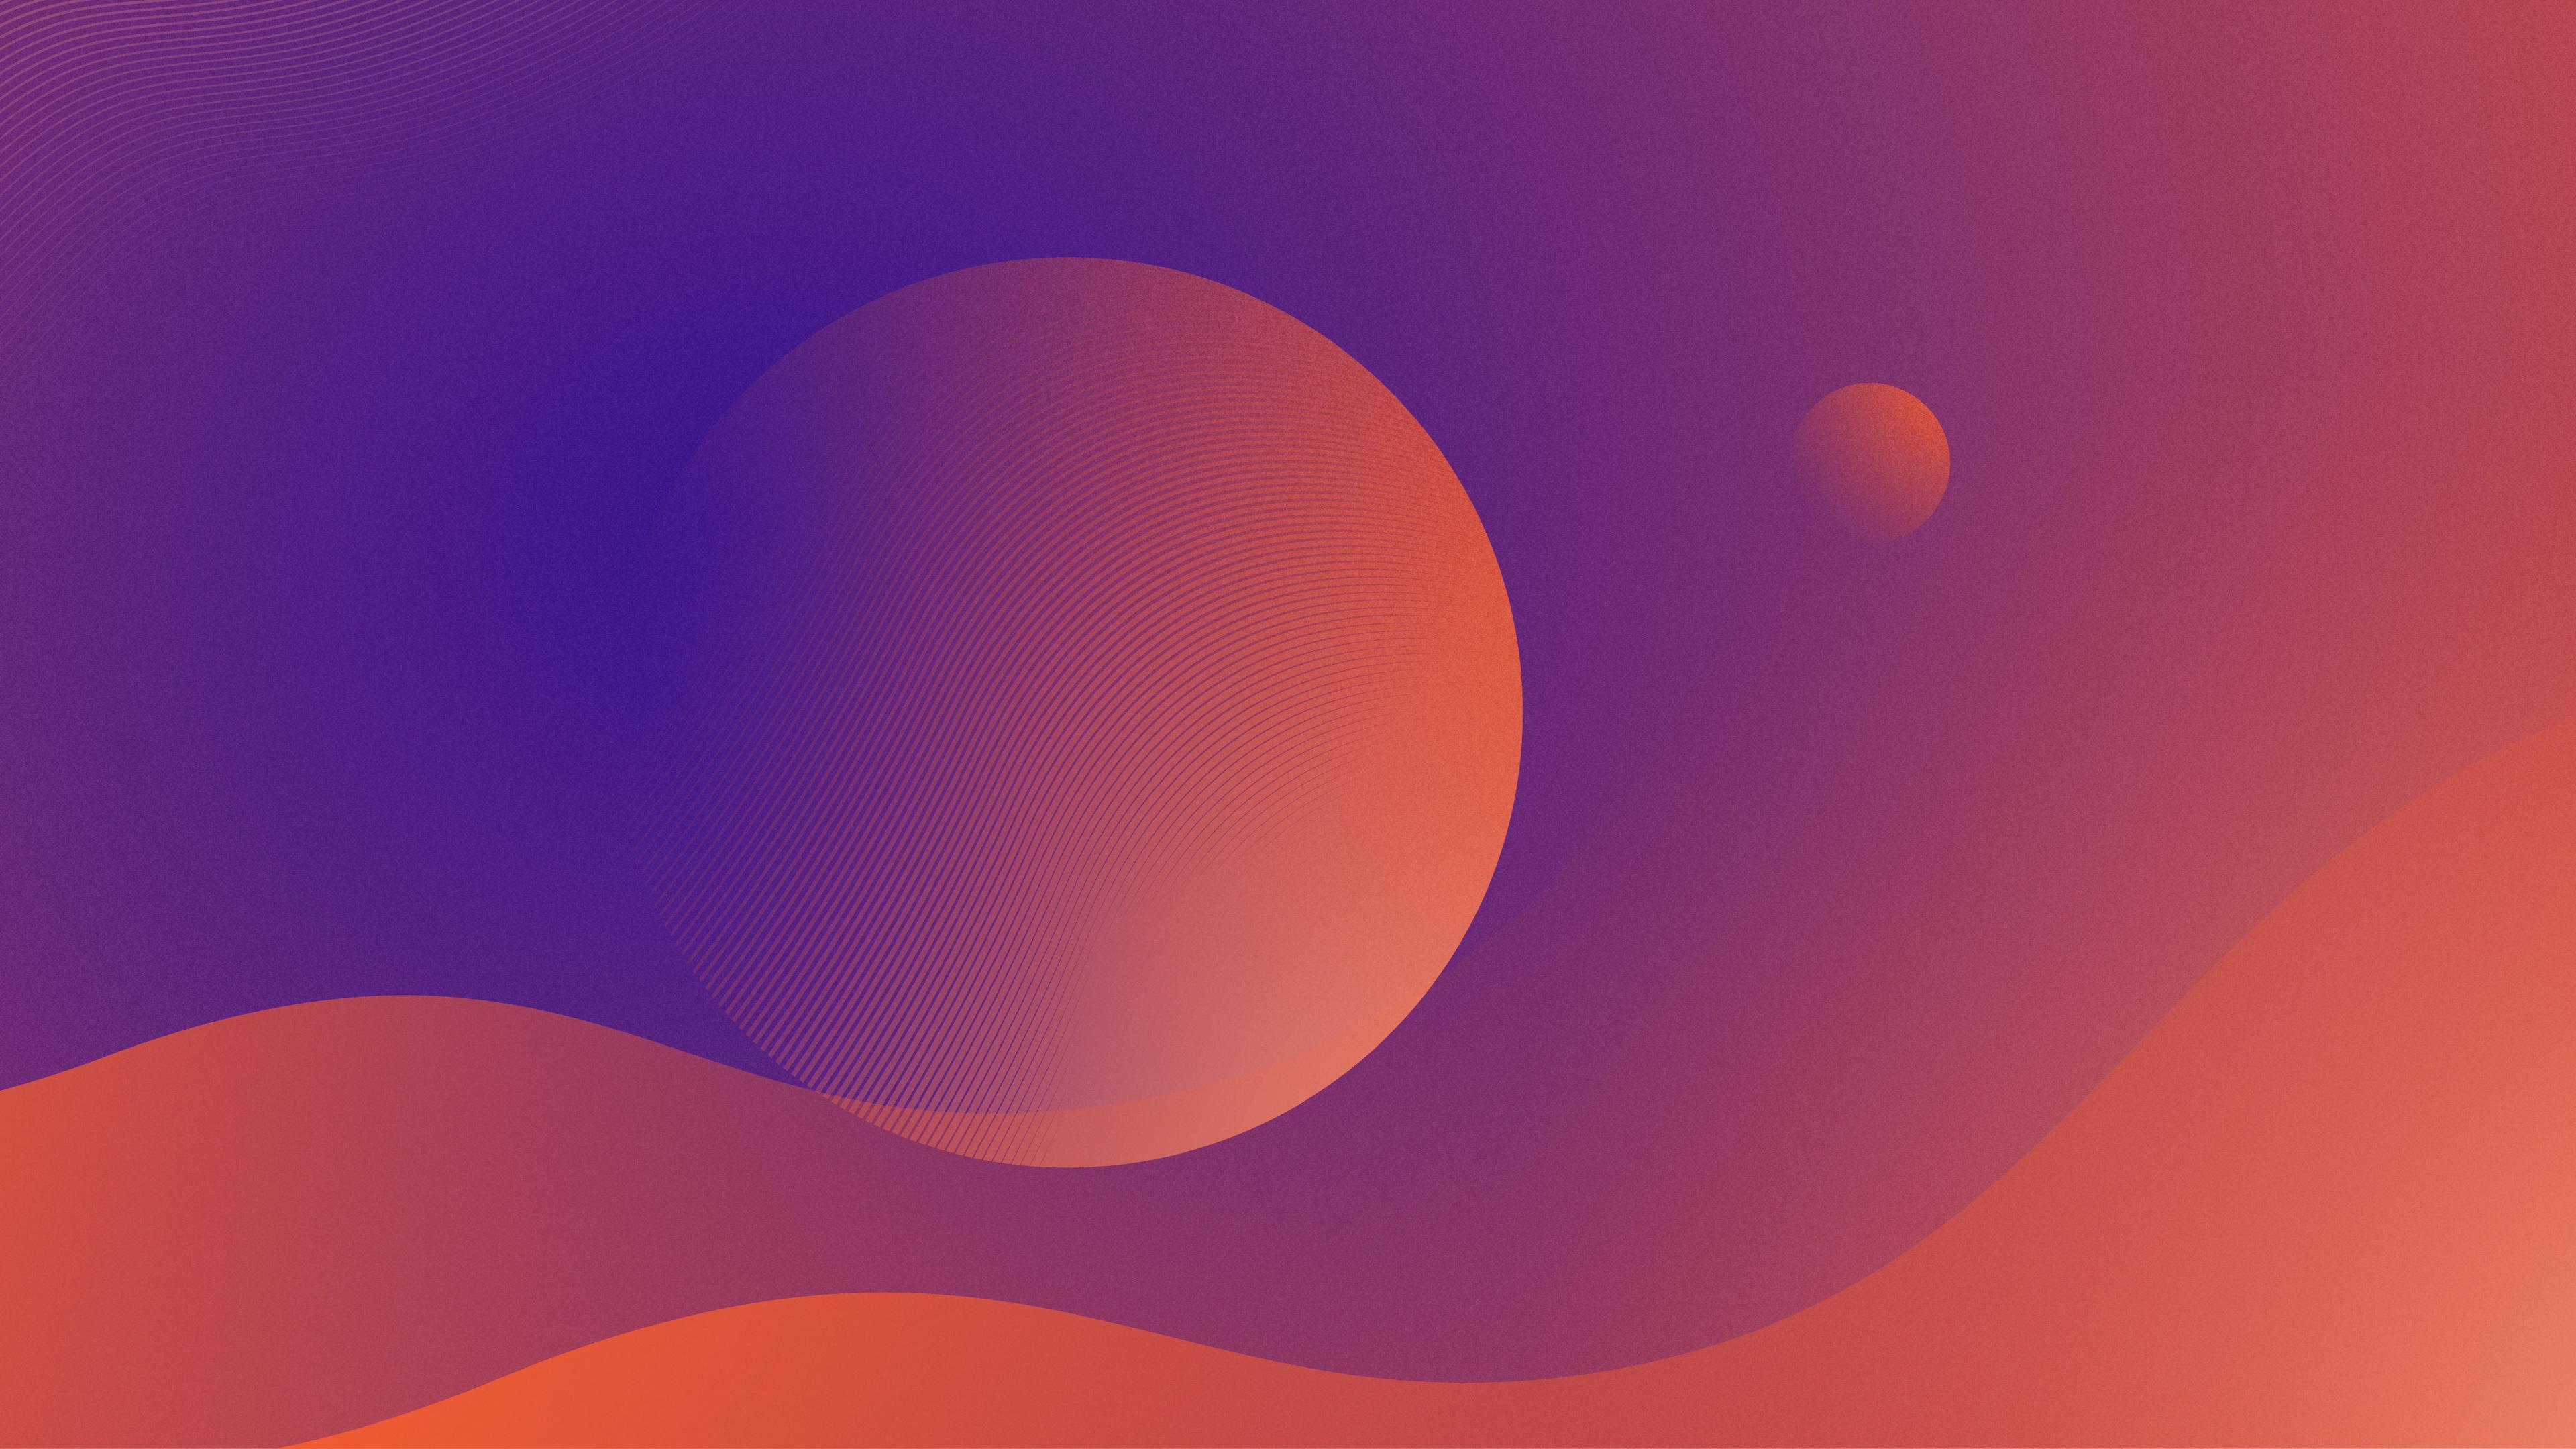 planet mars minimalism 4k 1540755499 - Planet Mars Minimalism 4k - planet wallpapers, minimalist wallpapers, minimalism wallpapers, mars wallpapers, hd-wallpapers, digital art wallpapers, deviantart wallpapers, artwork wallpapers, artist wallpapers, 4k-wallpapers